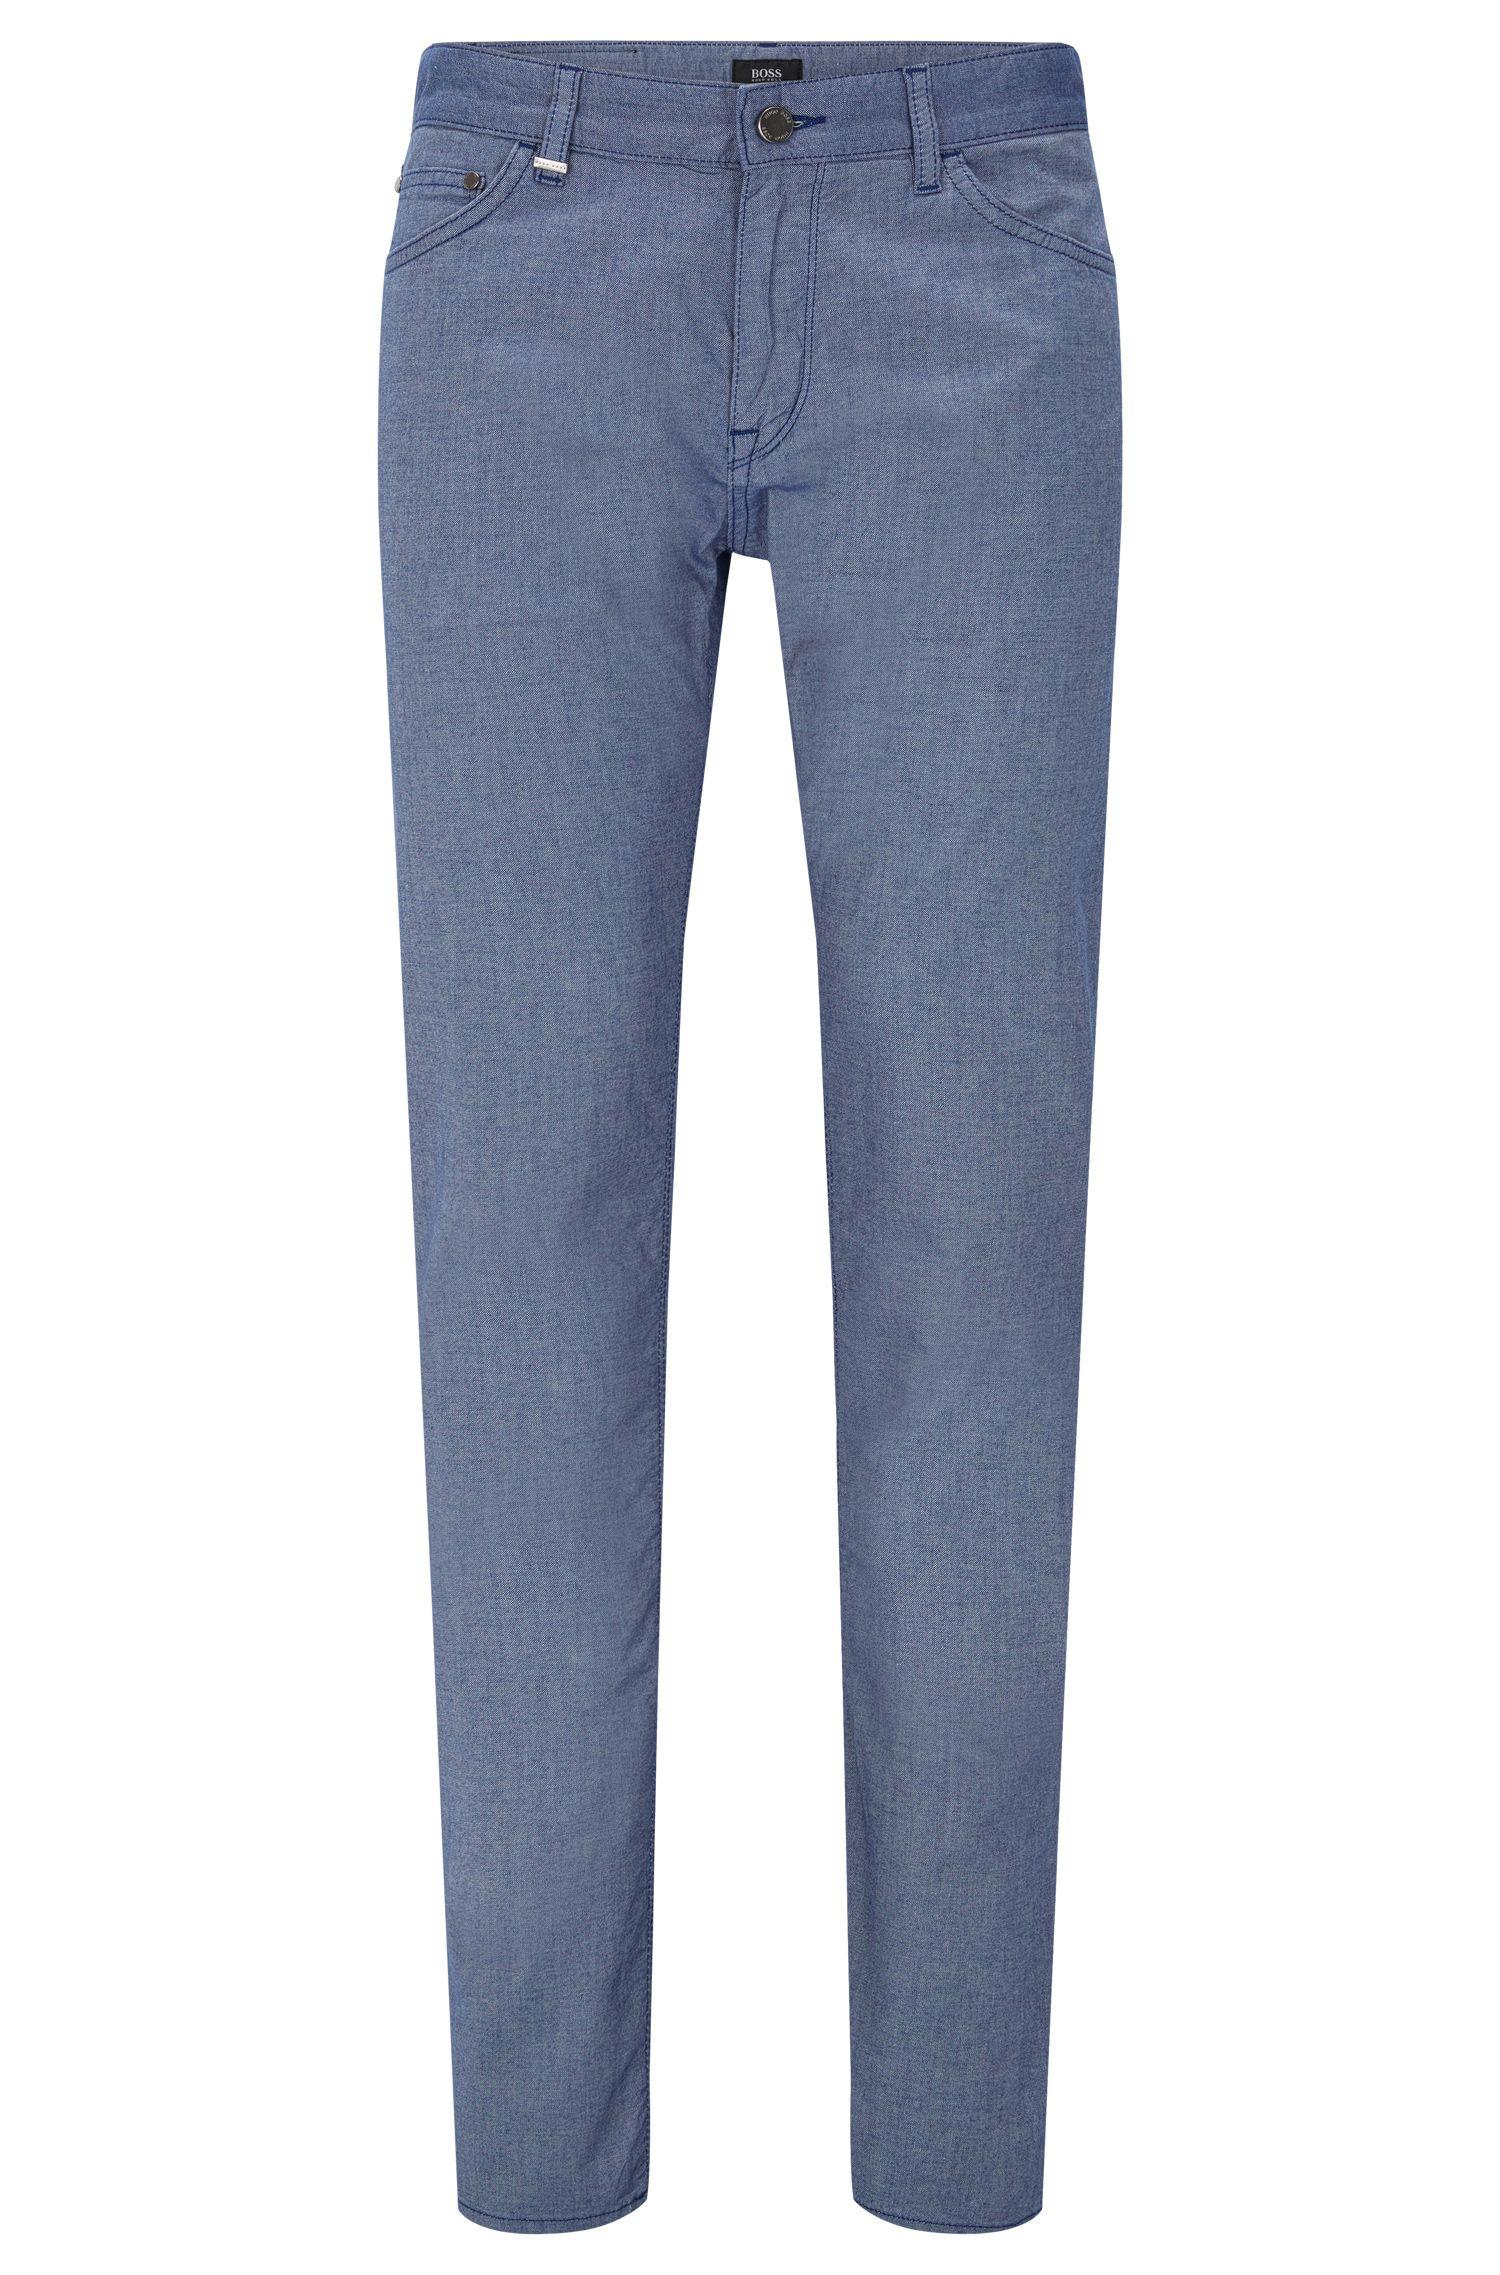 'Maine' | Regular Fit, 11.6 oz Stretch Cotton Jeans